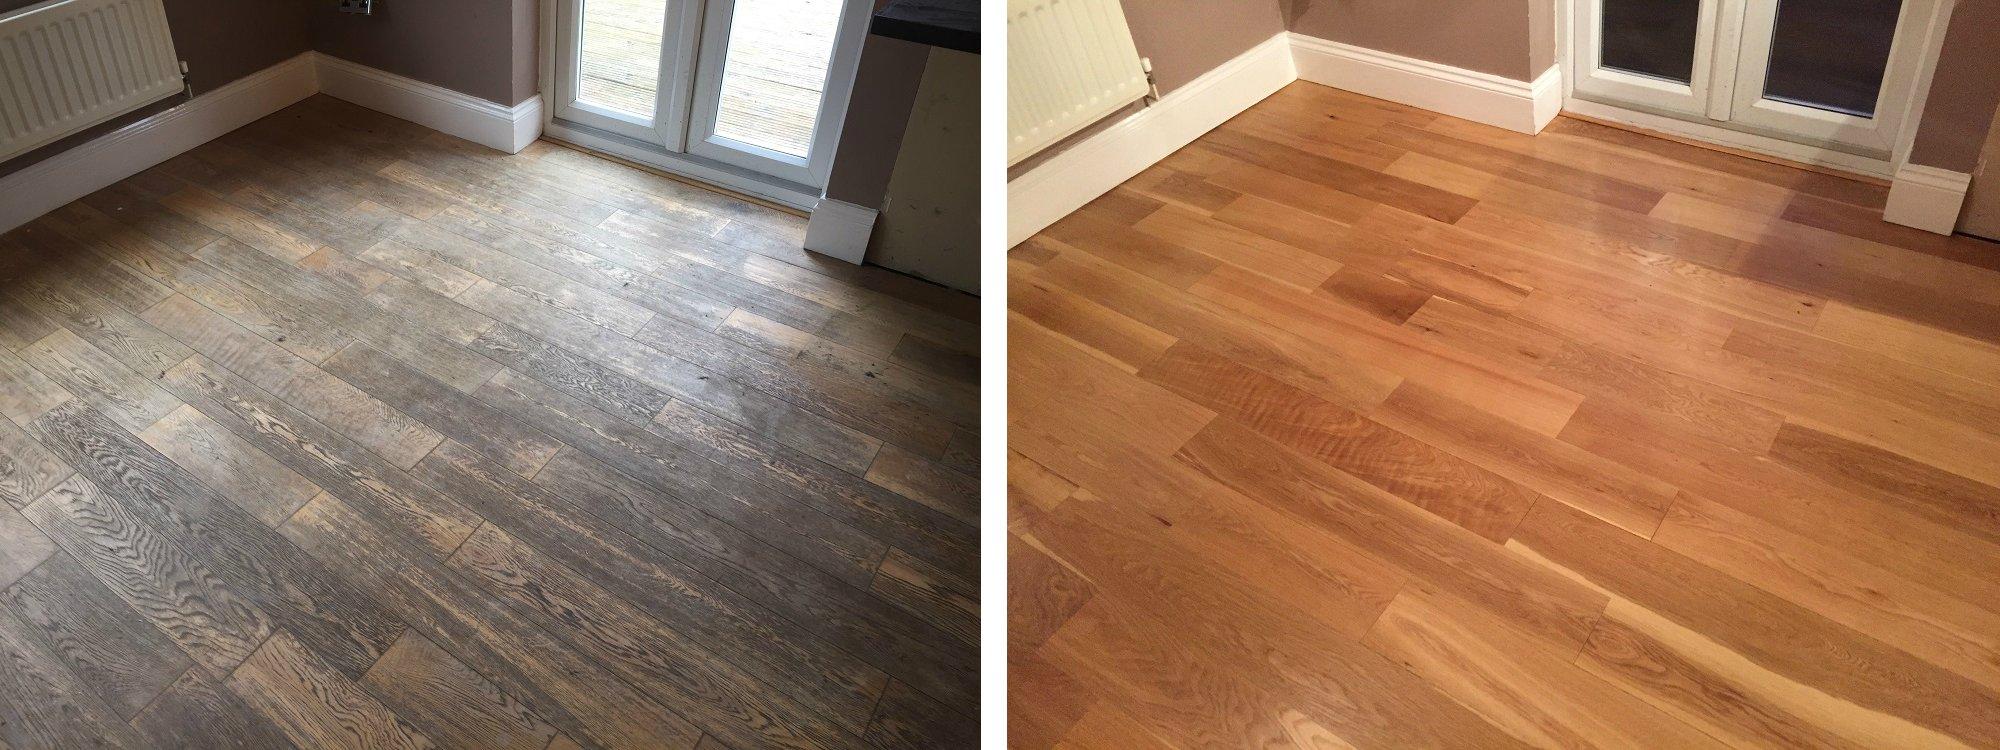 Floor Sanding In Stevenage And Hertfordshire